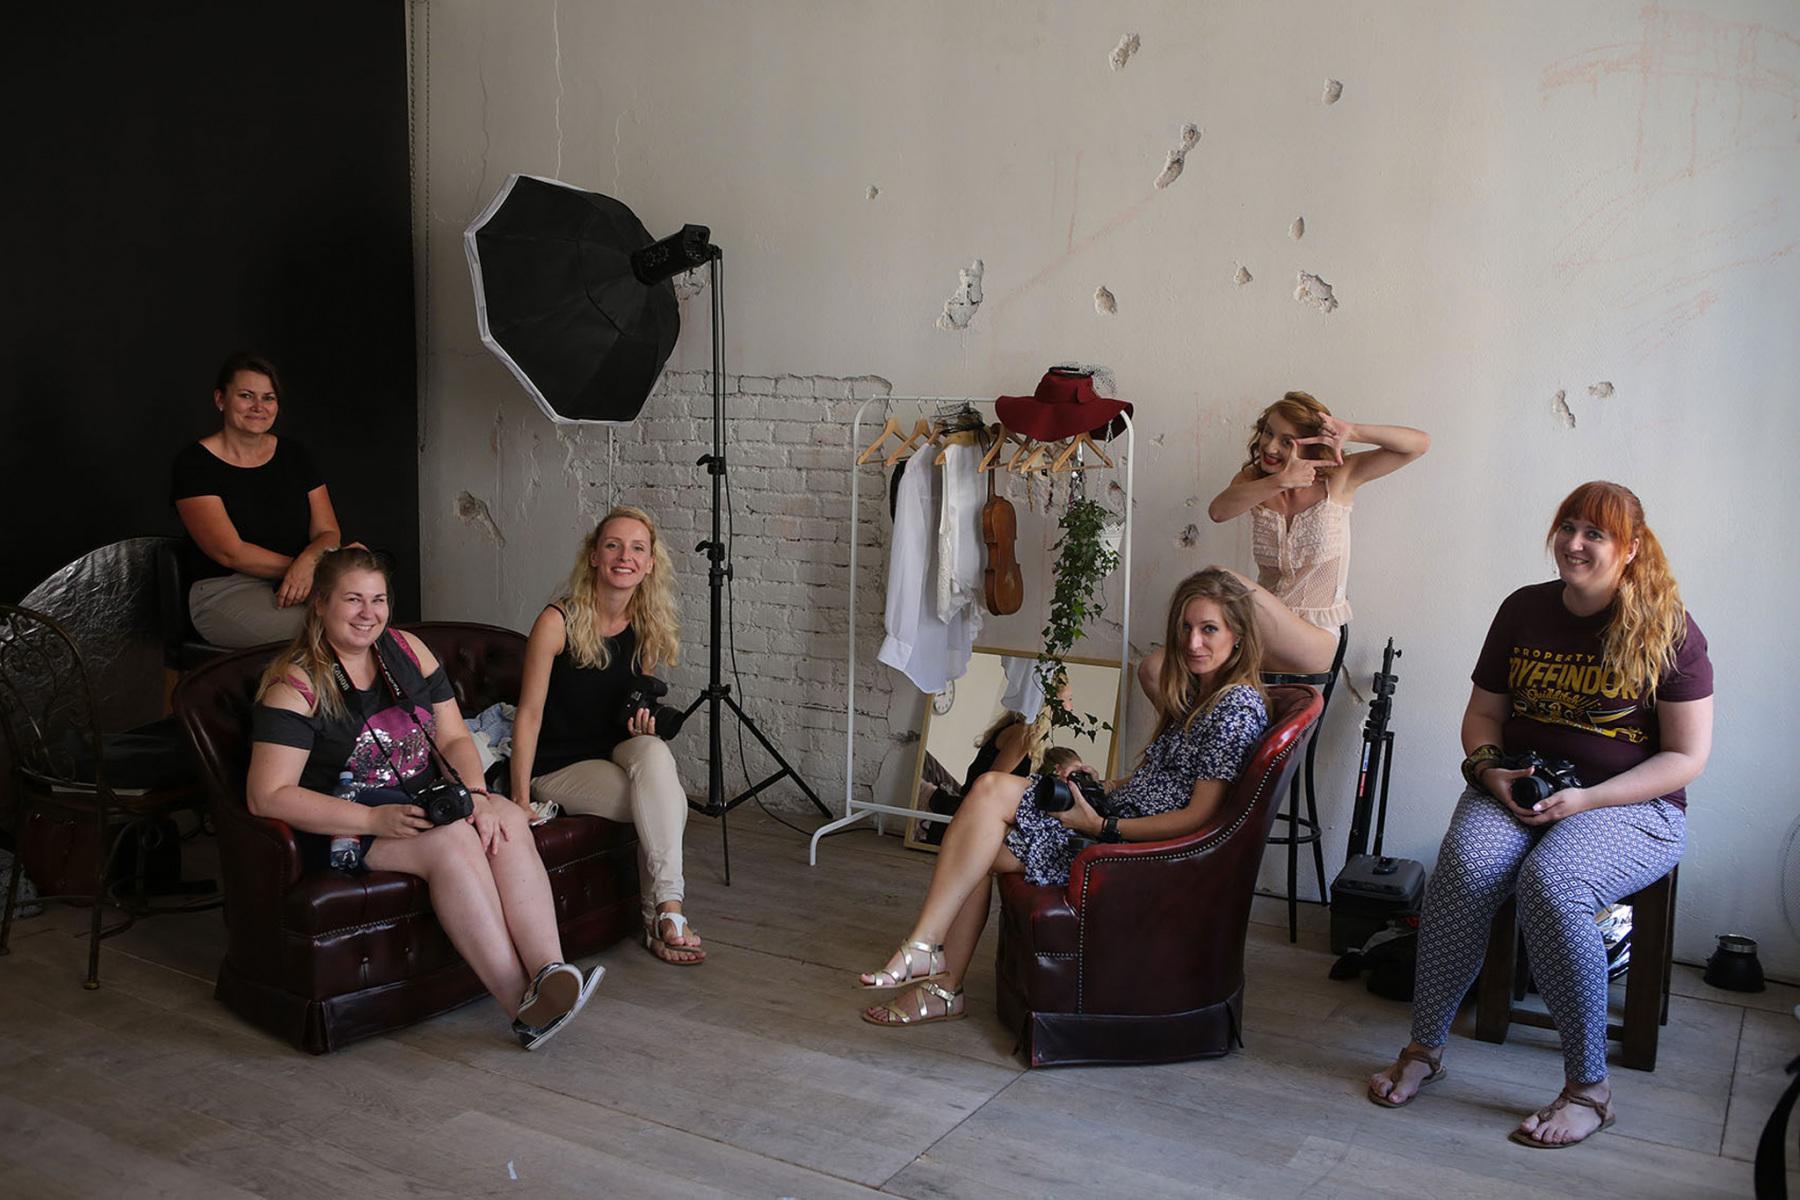 Katerina_Janisova_Masterclass_Workshop_Fotokurz-11